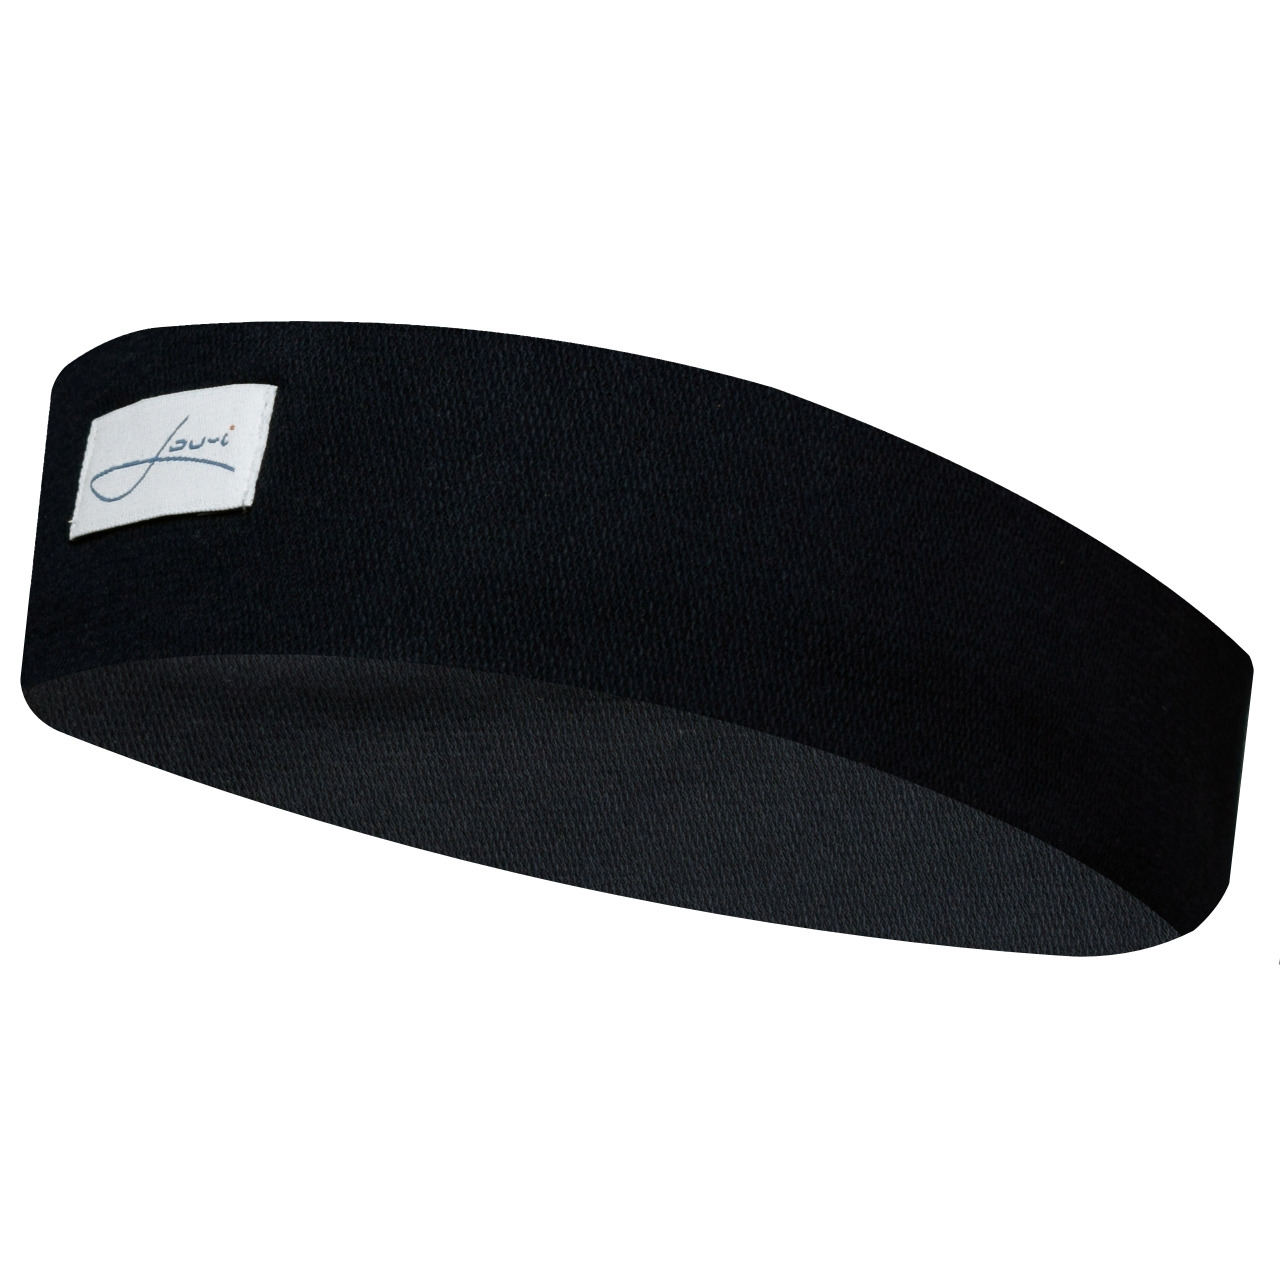 stirnband-schwarz-baumwolle-damen-herren-winter-sommer-made-in-germany-lou-itlhLyyXQU20i1